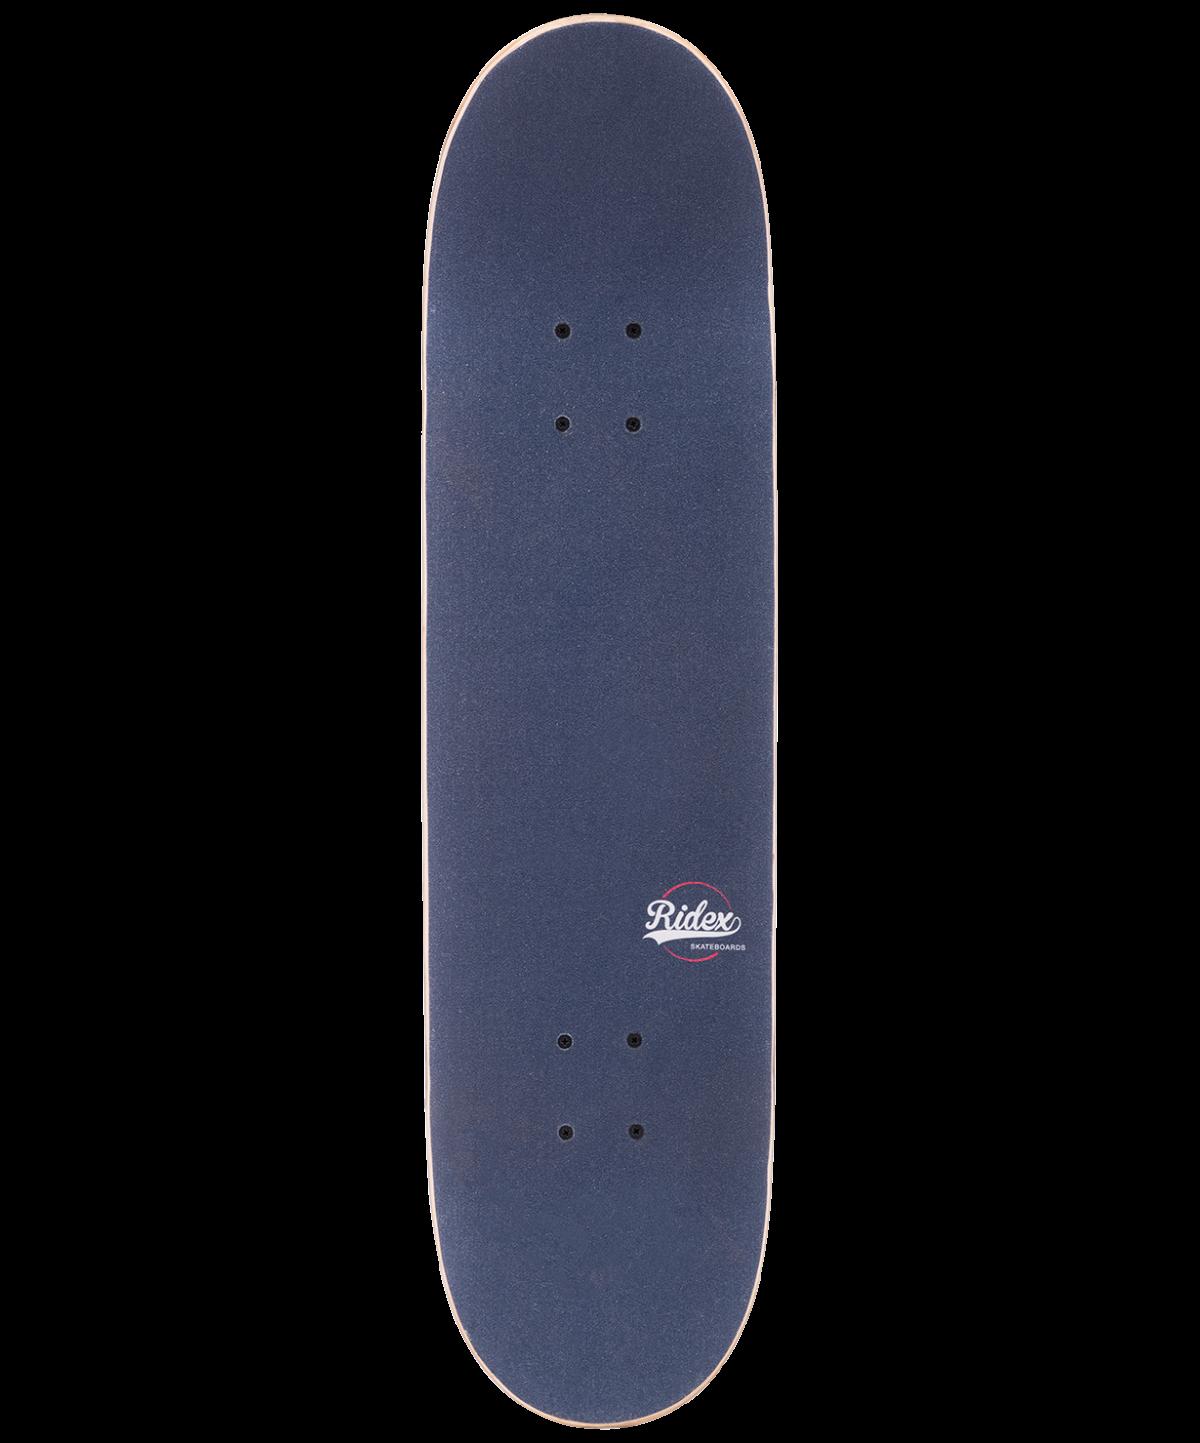 RIDEX скейтборд Blacksea - 3